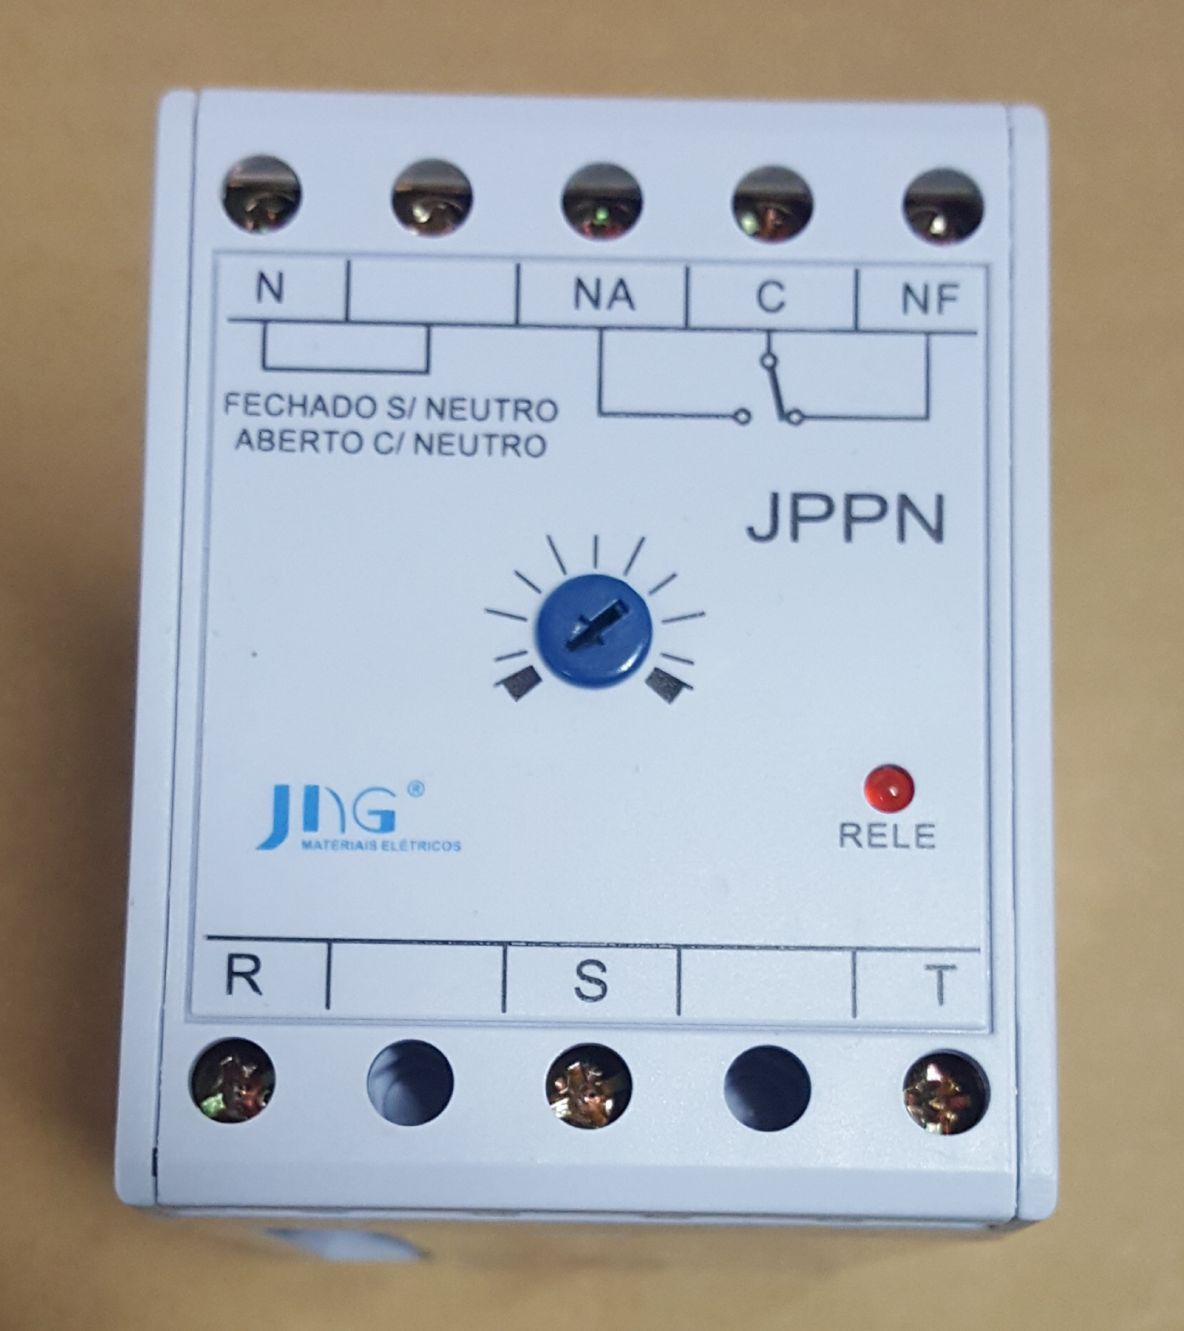 RELE FALTA DE FASE  JPPN 380Vca